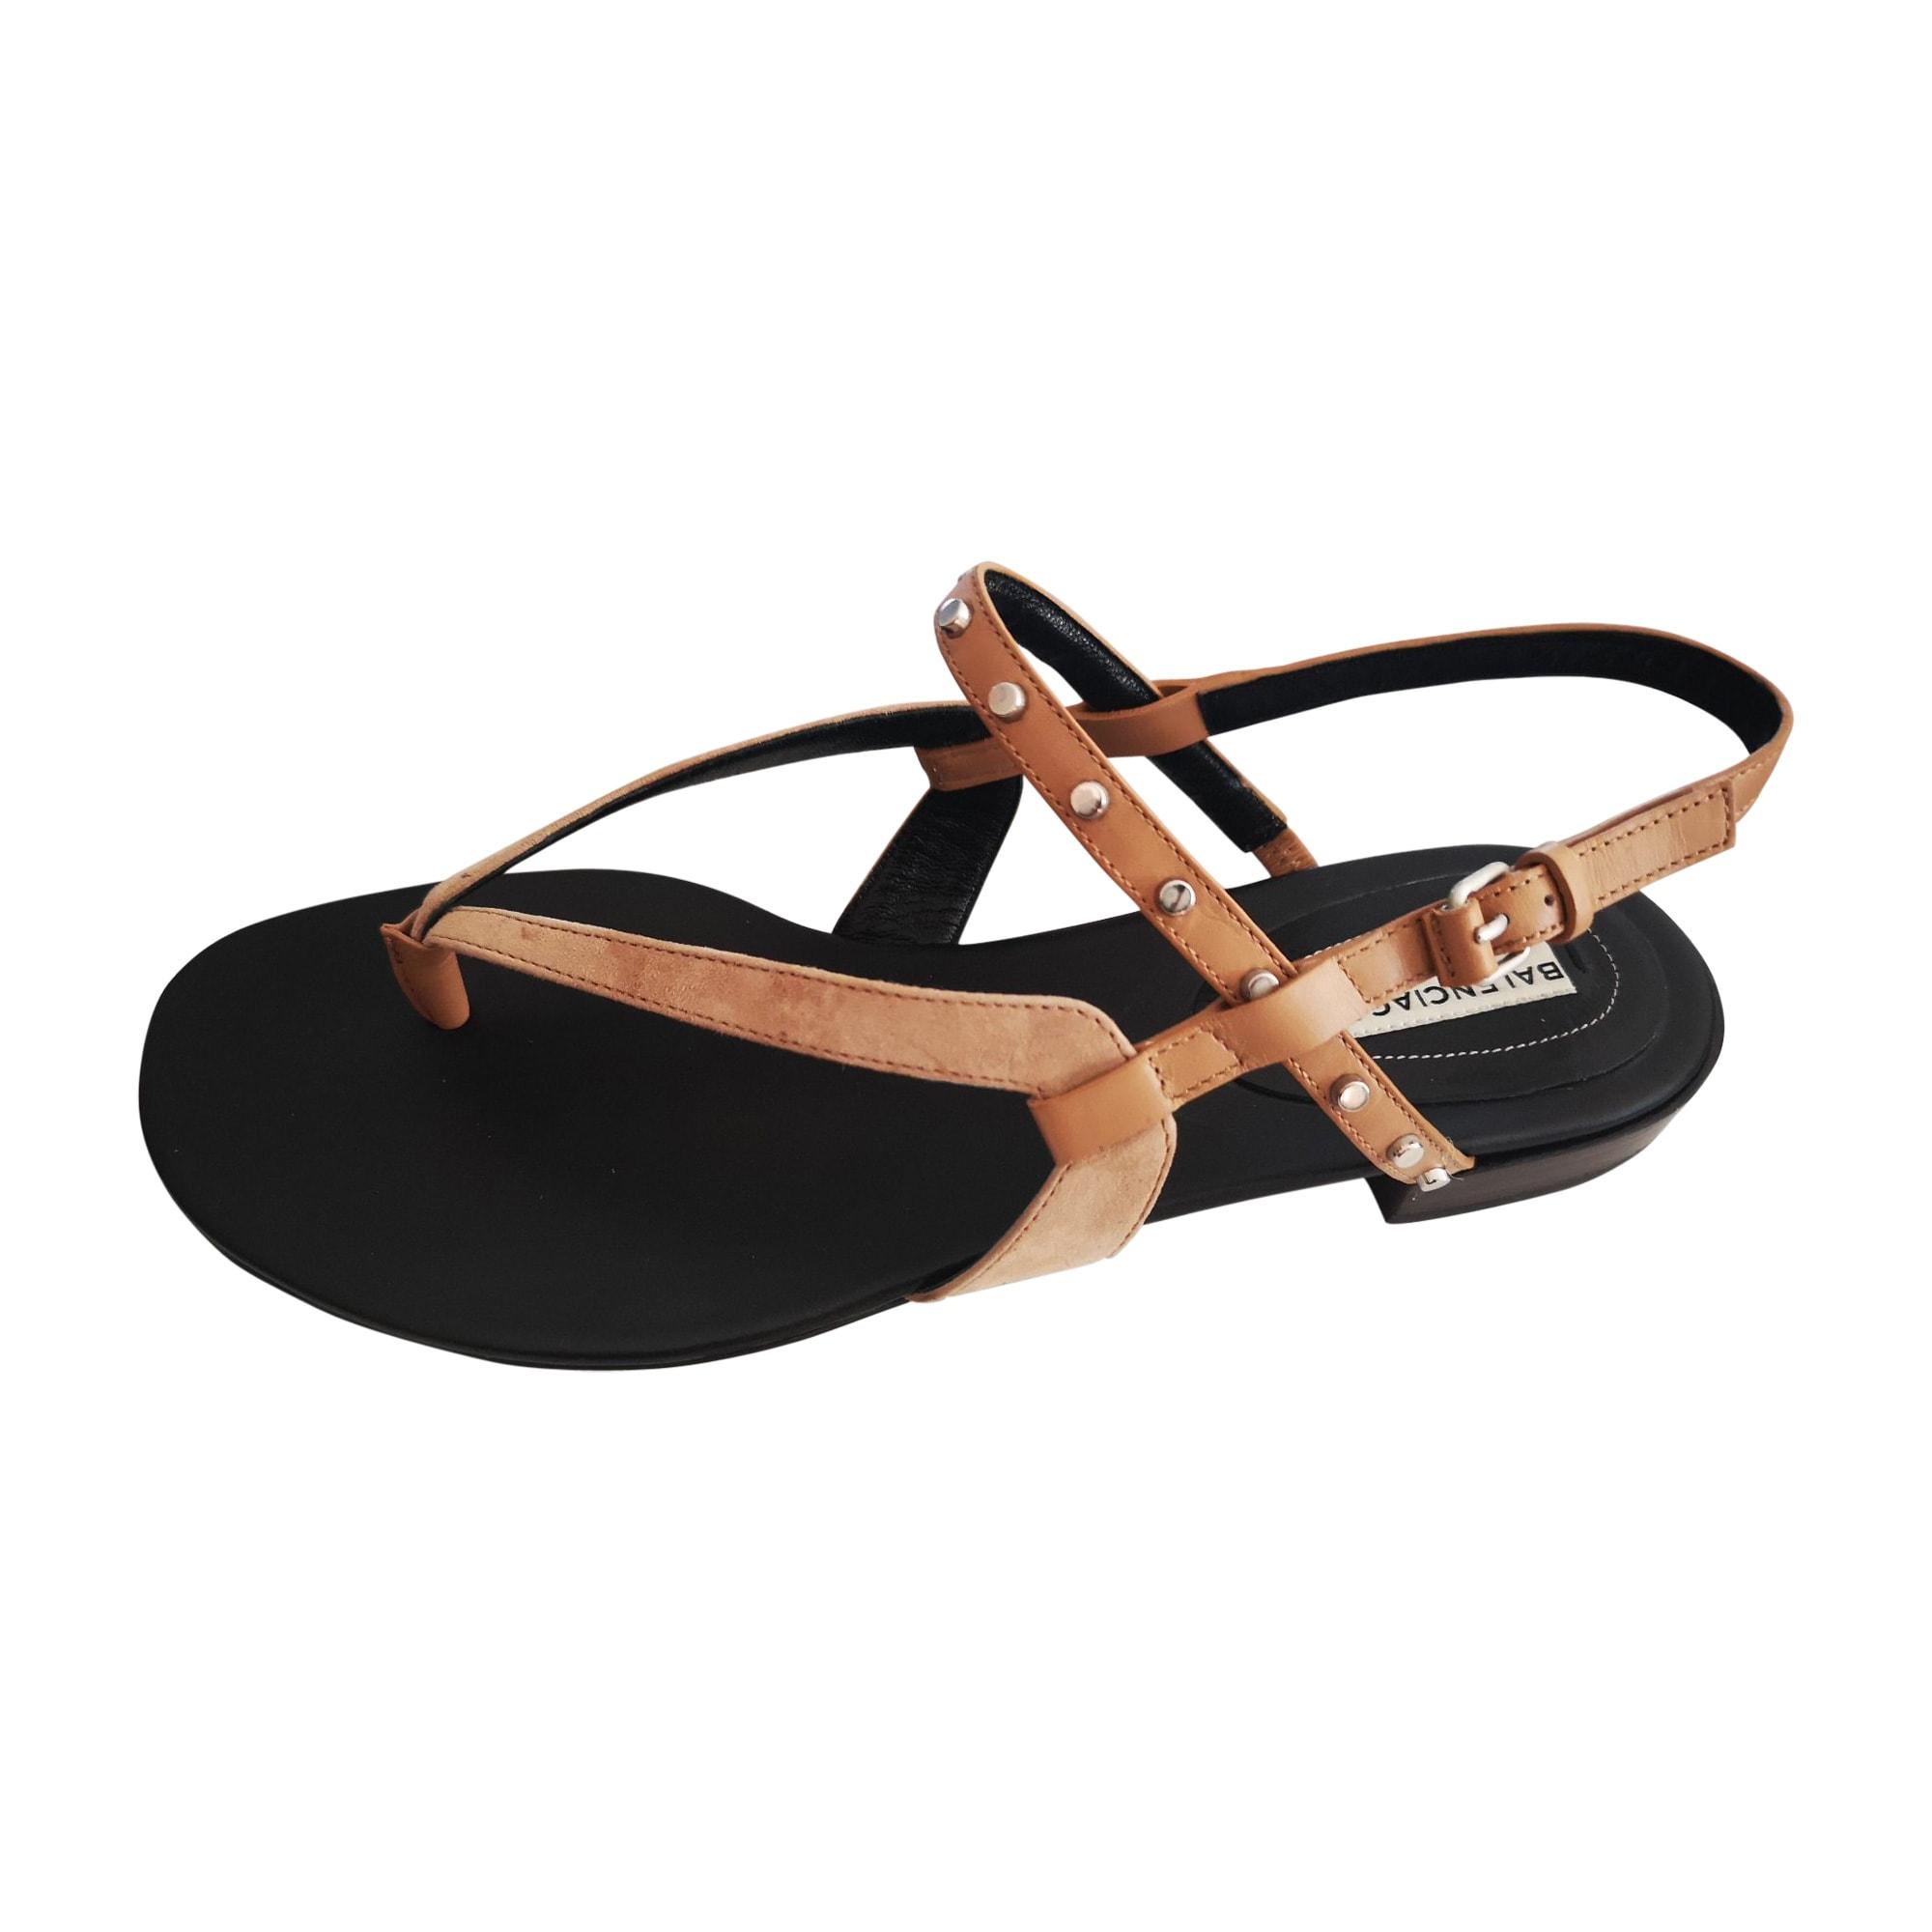 Sandales plates  BALENCIAGA Beige, camel